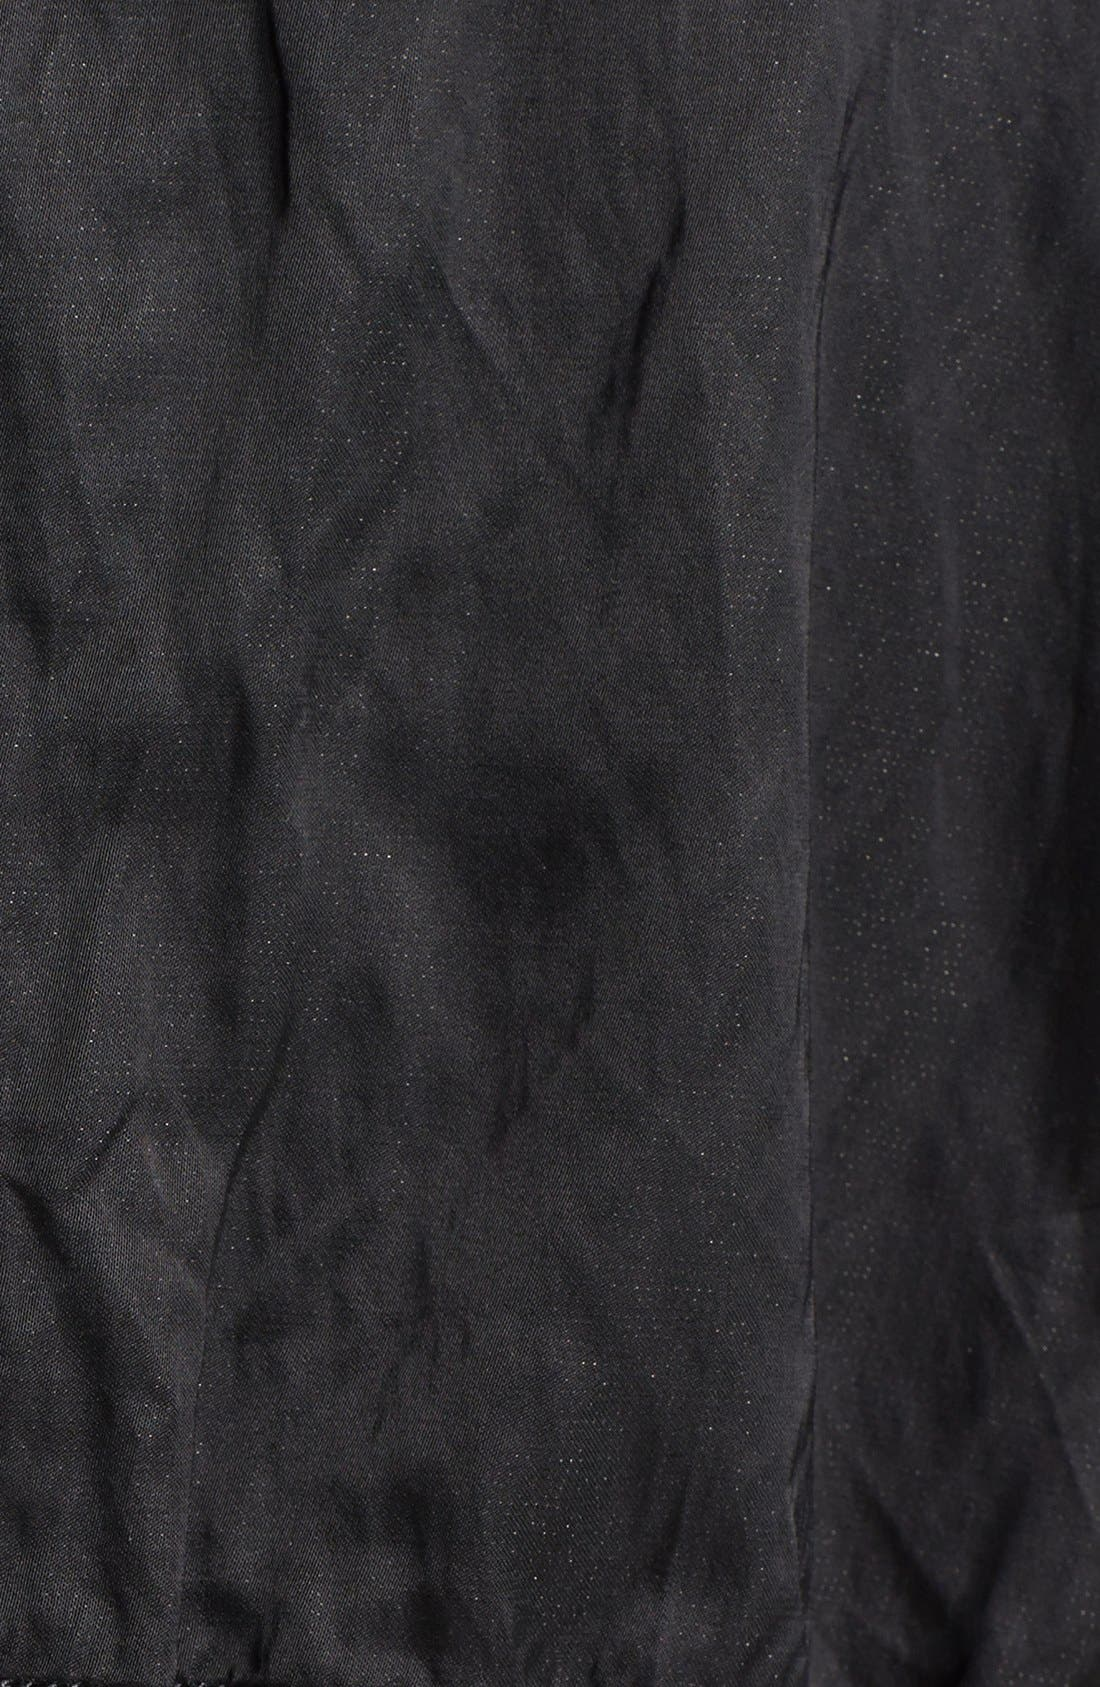 'Luxe' Anorak Jacket,                             Alternate thumbnail 3, color,                             001